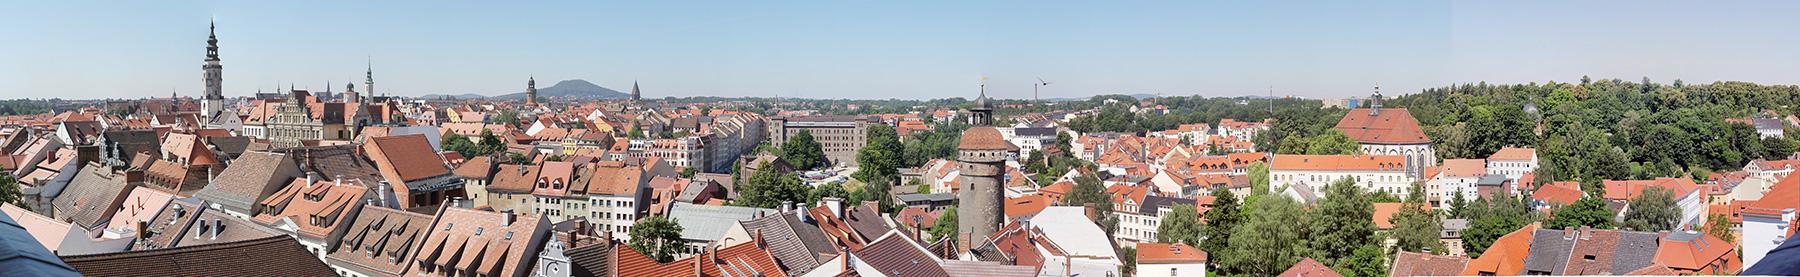 Goerlitz Blick vom Kirchturm